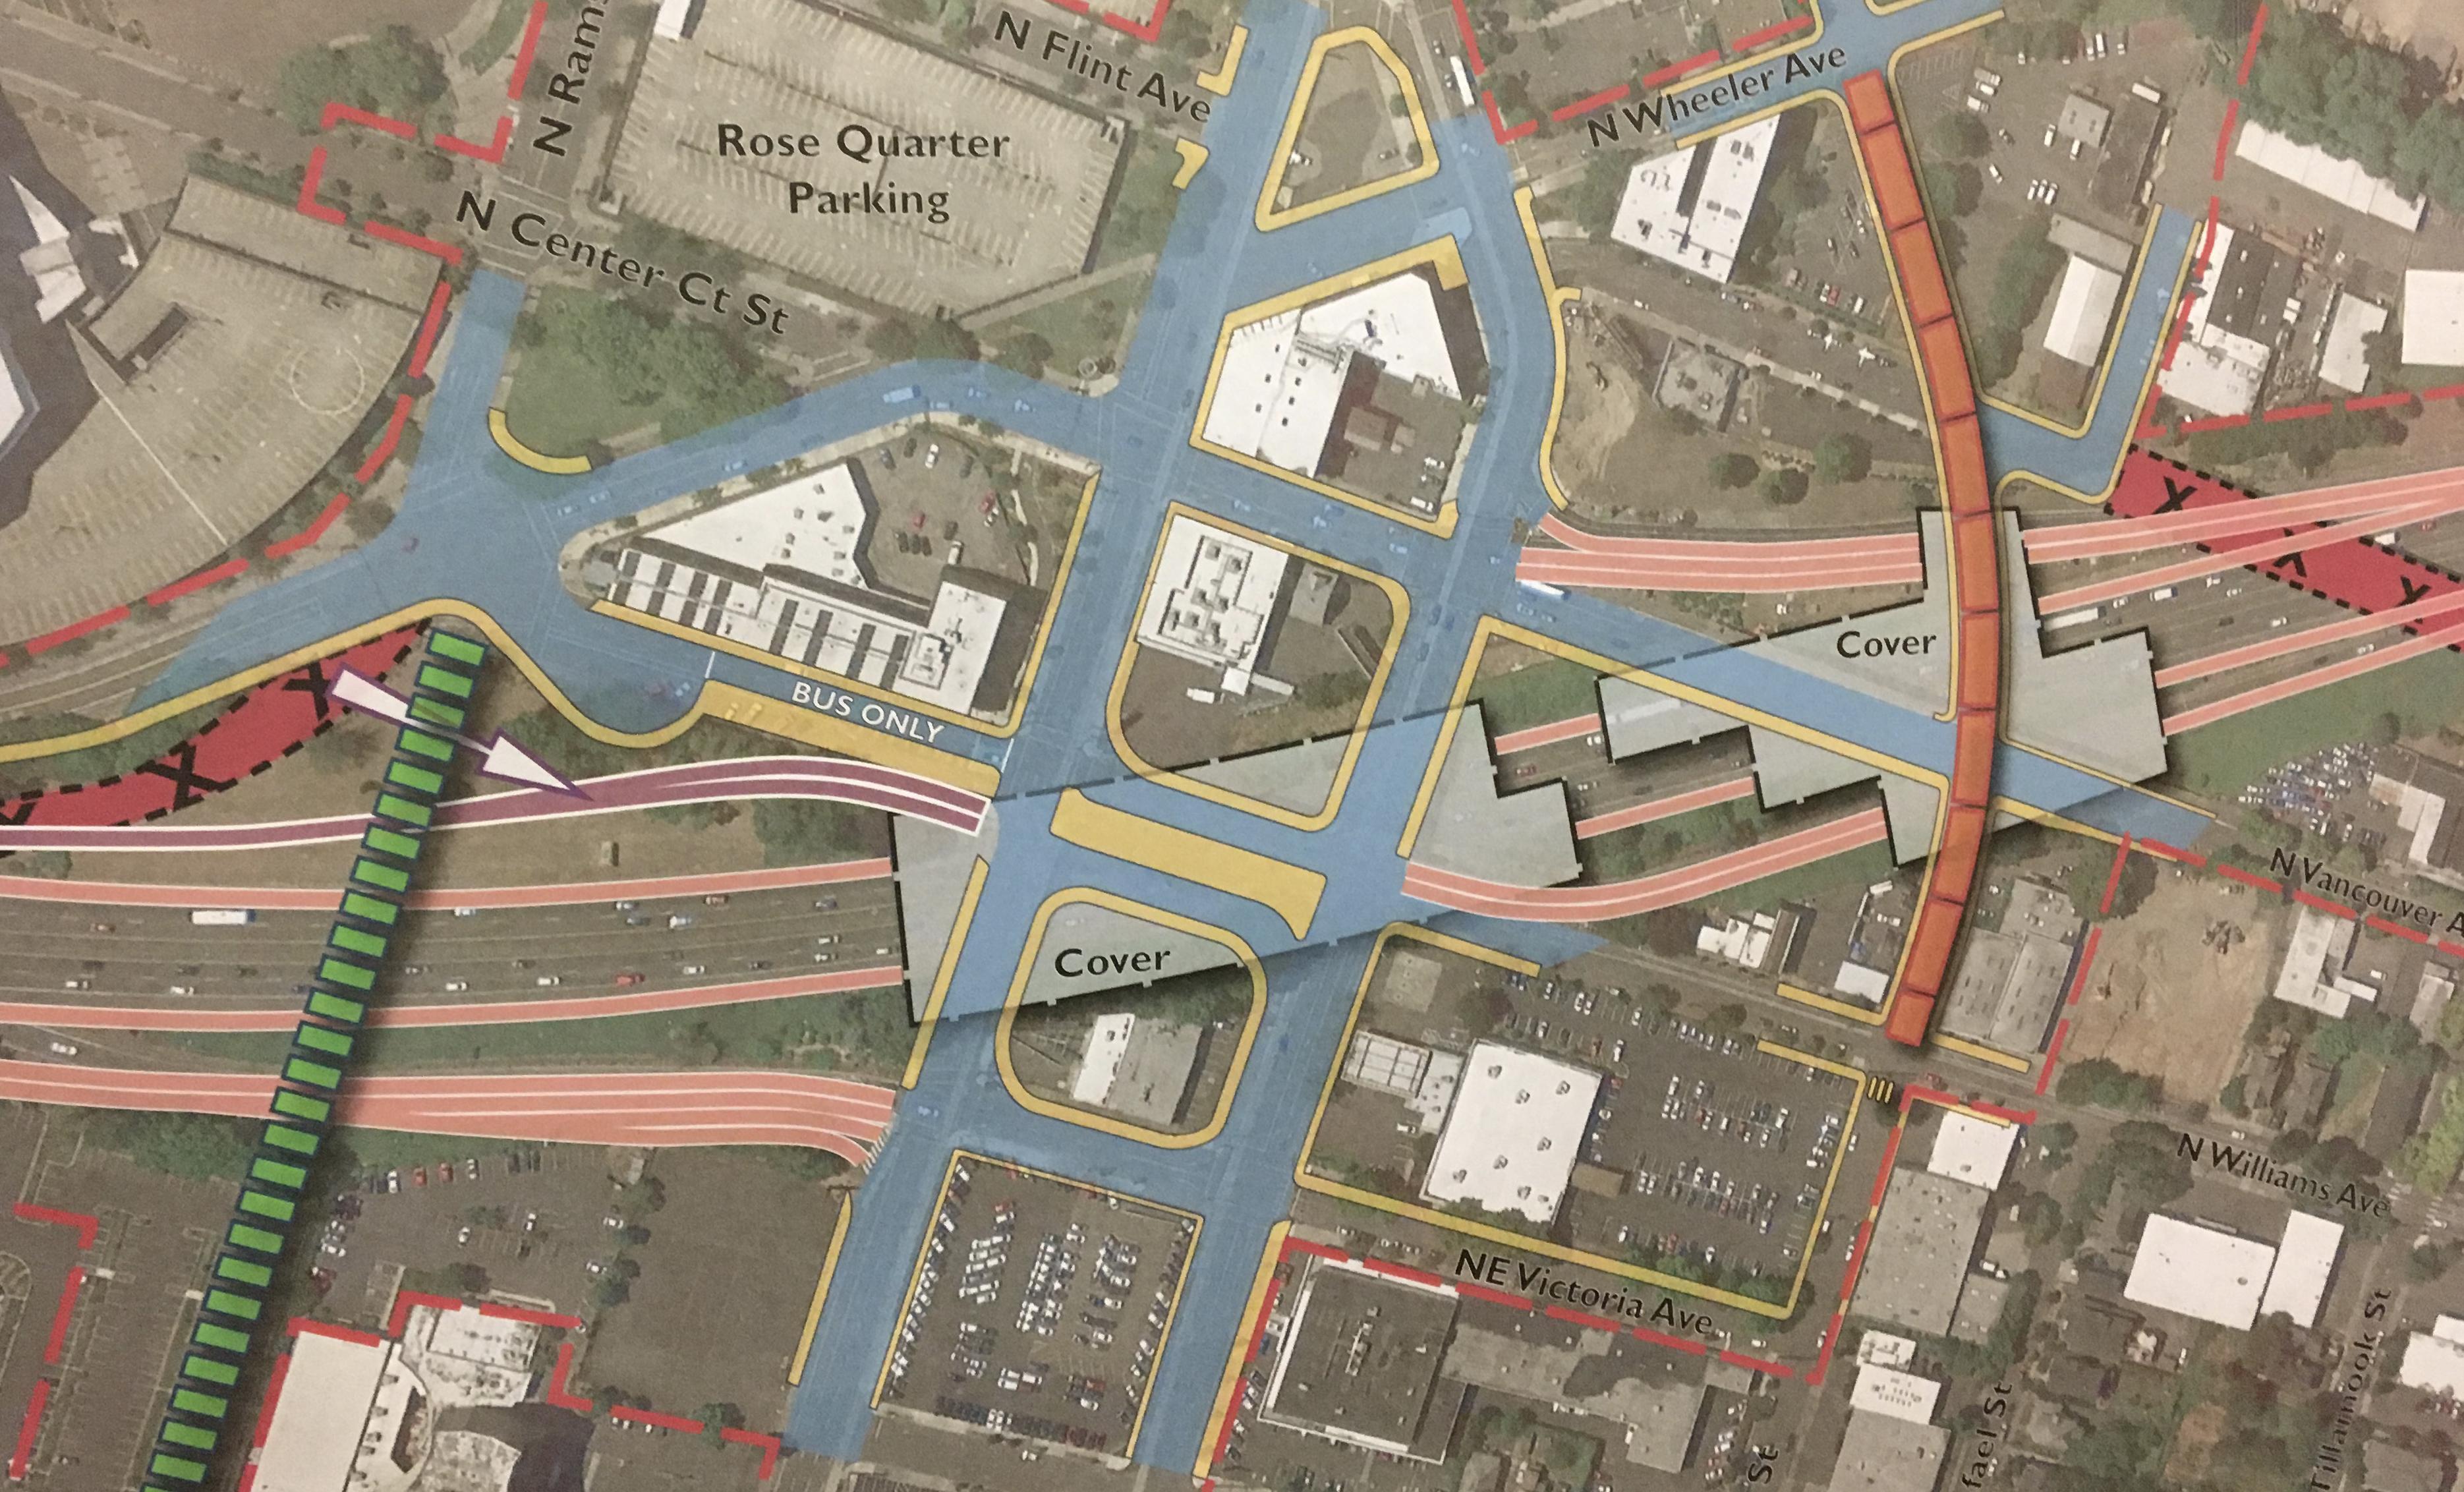 In radio interview, Portland Mayor rebuts critics of I-5 Rose Quarter  project - BikePortland org